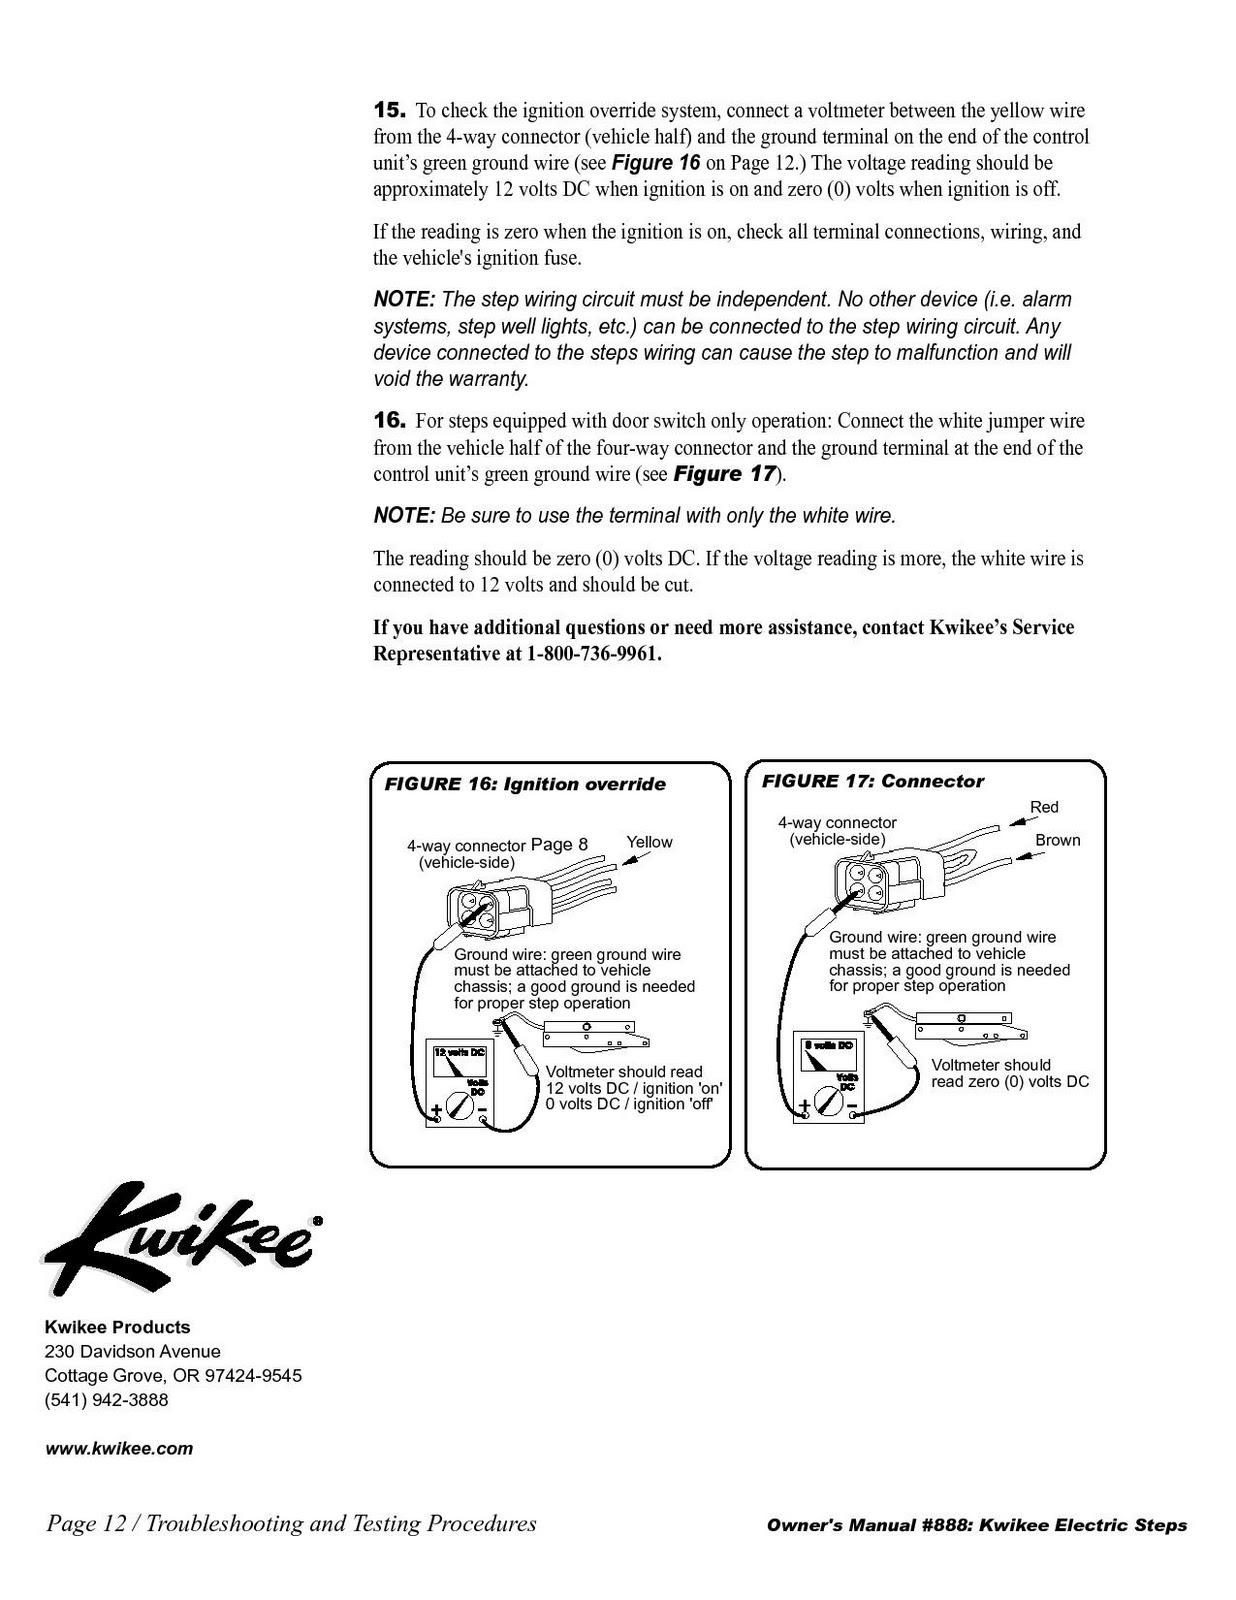 medium resolution of 1983 pace arrow wiring diagram 1983 pace arrow motorhome wiring diagram 85 pace arrow wiring diagram